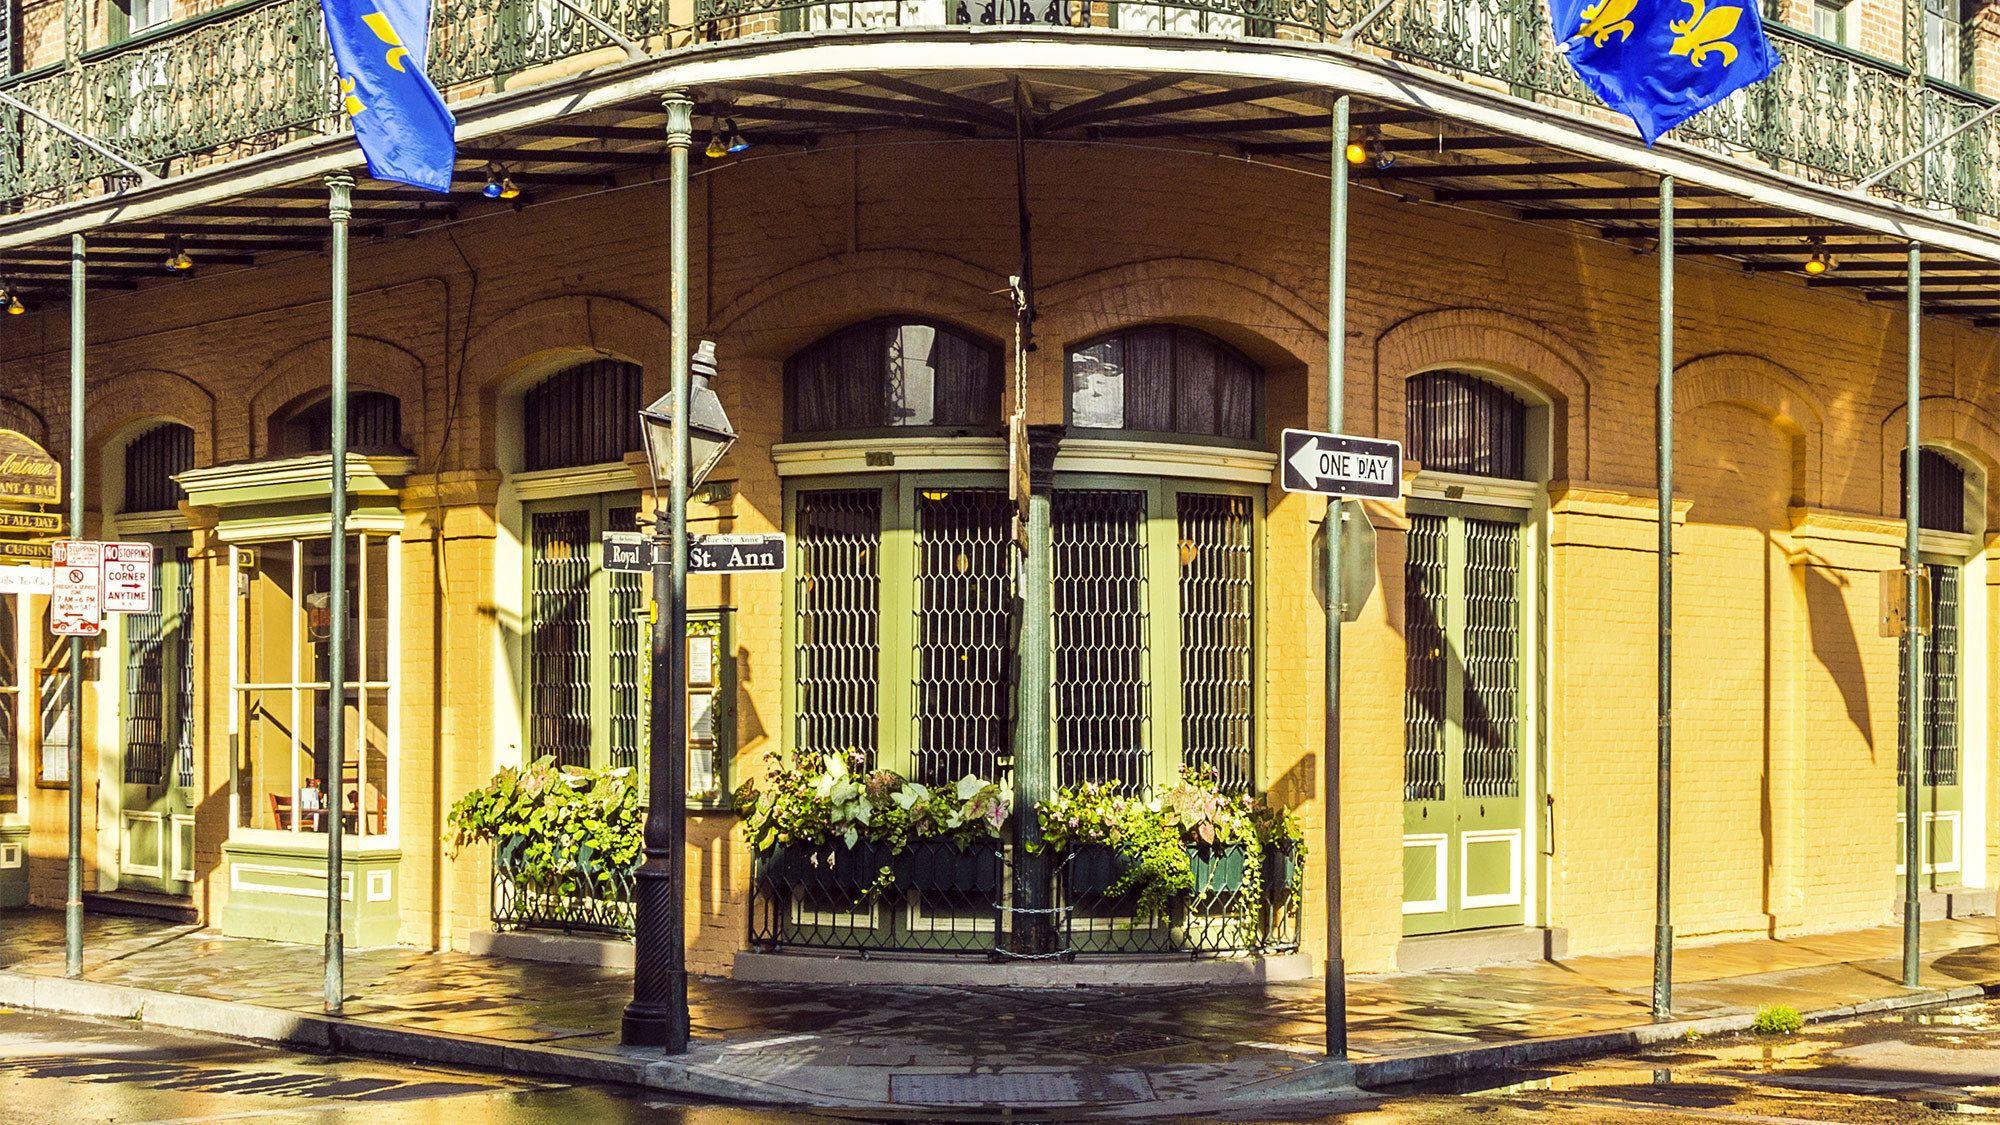 Street corner in New Orleans, LA